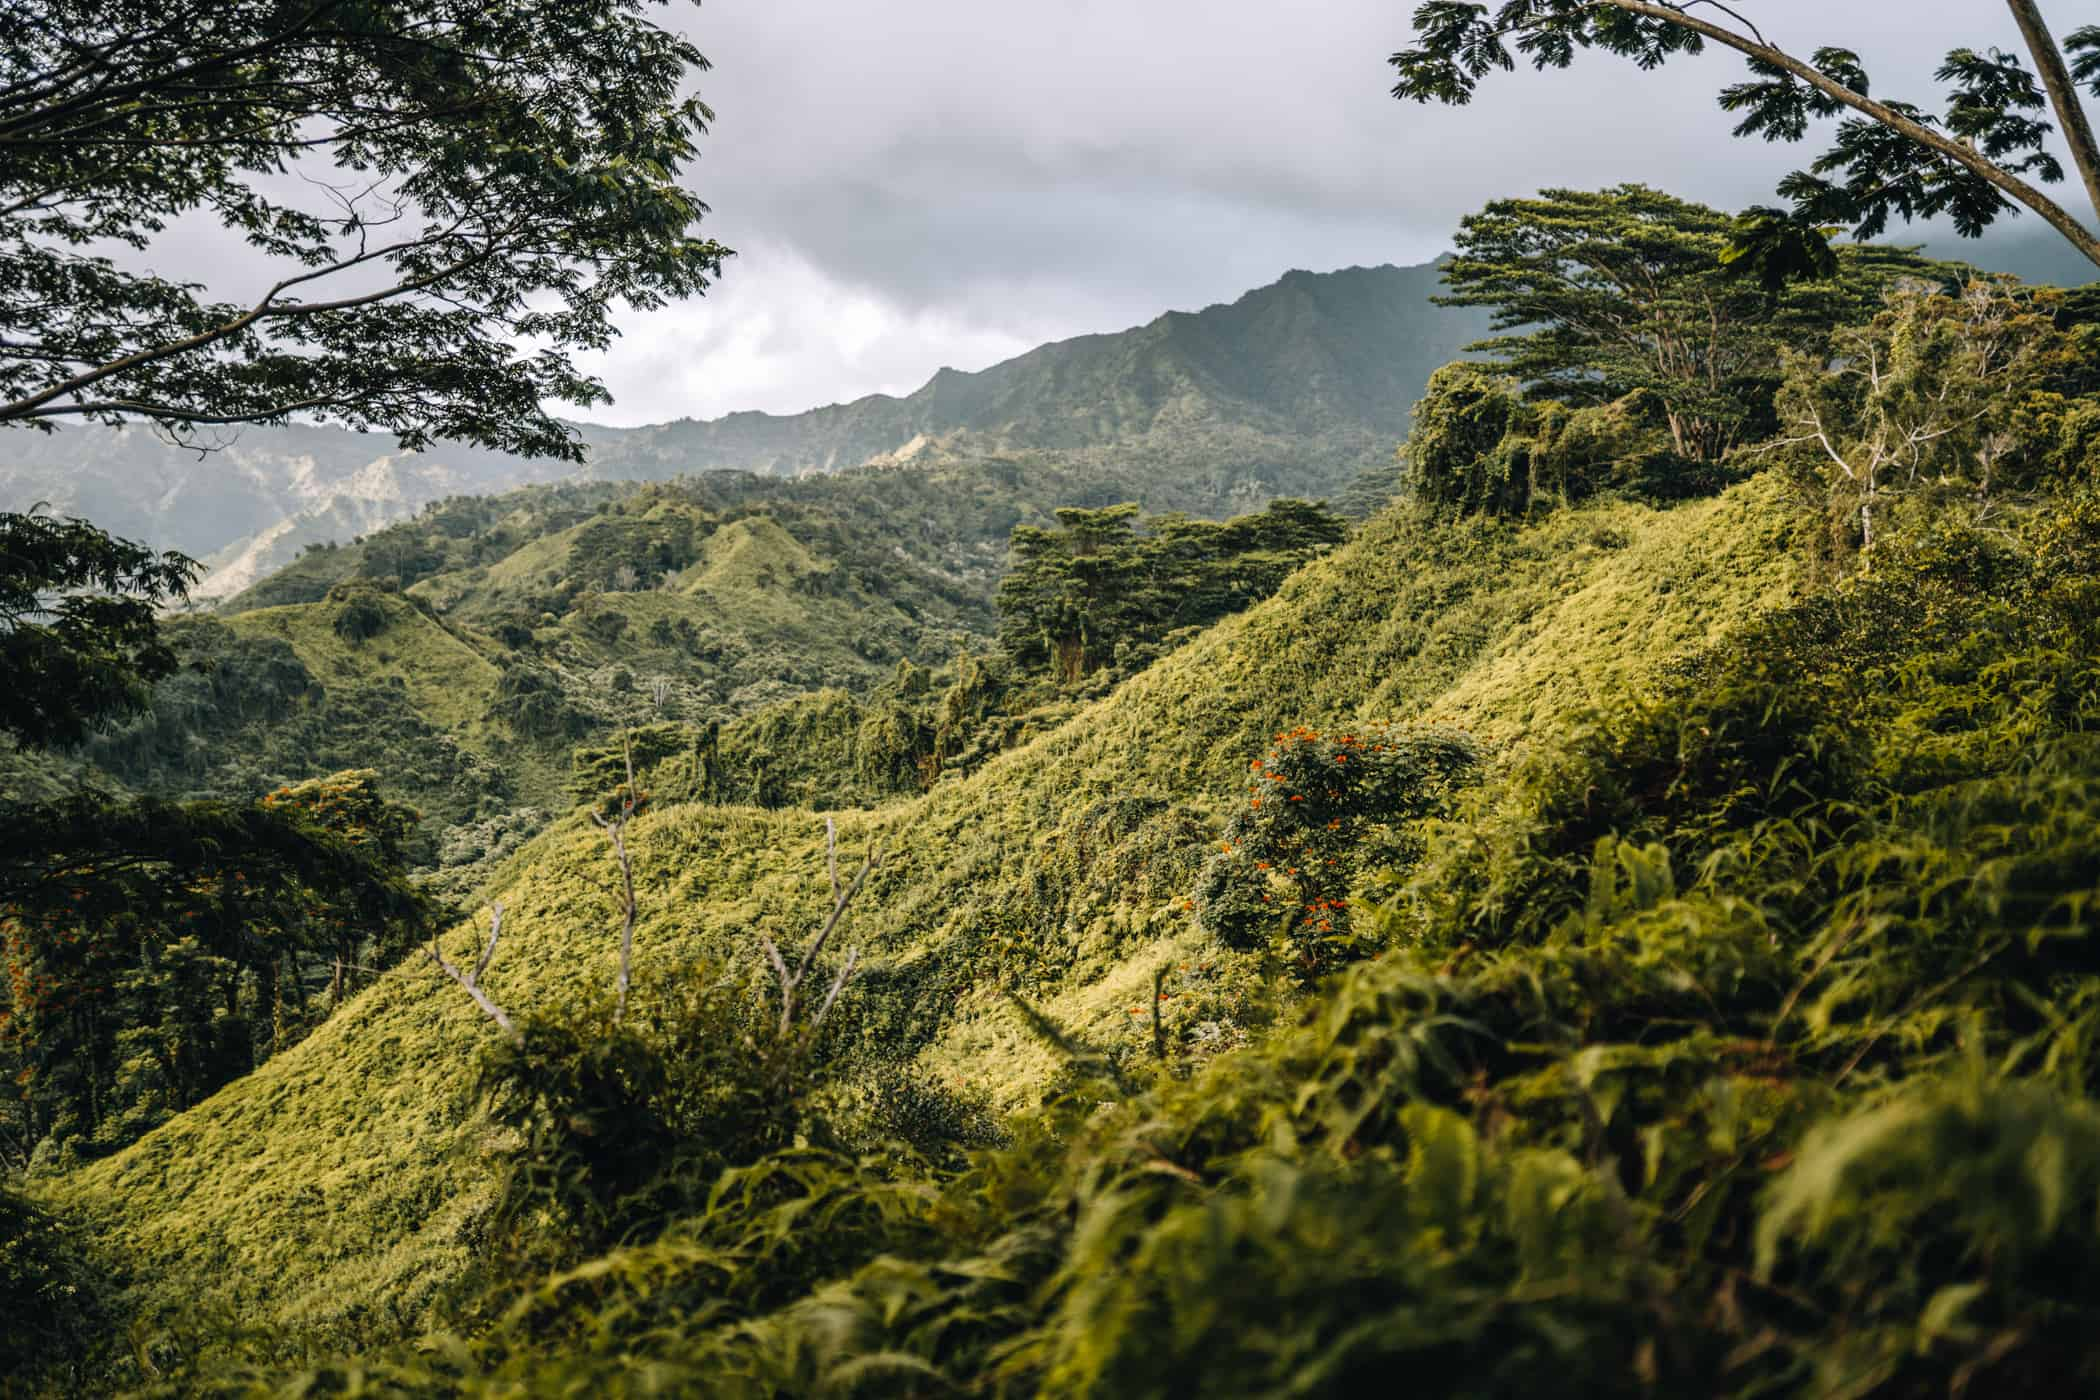 Kauai - Strände, Wandern & Ausflugsziele: Aussicht am Kuilao Ridge Trail